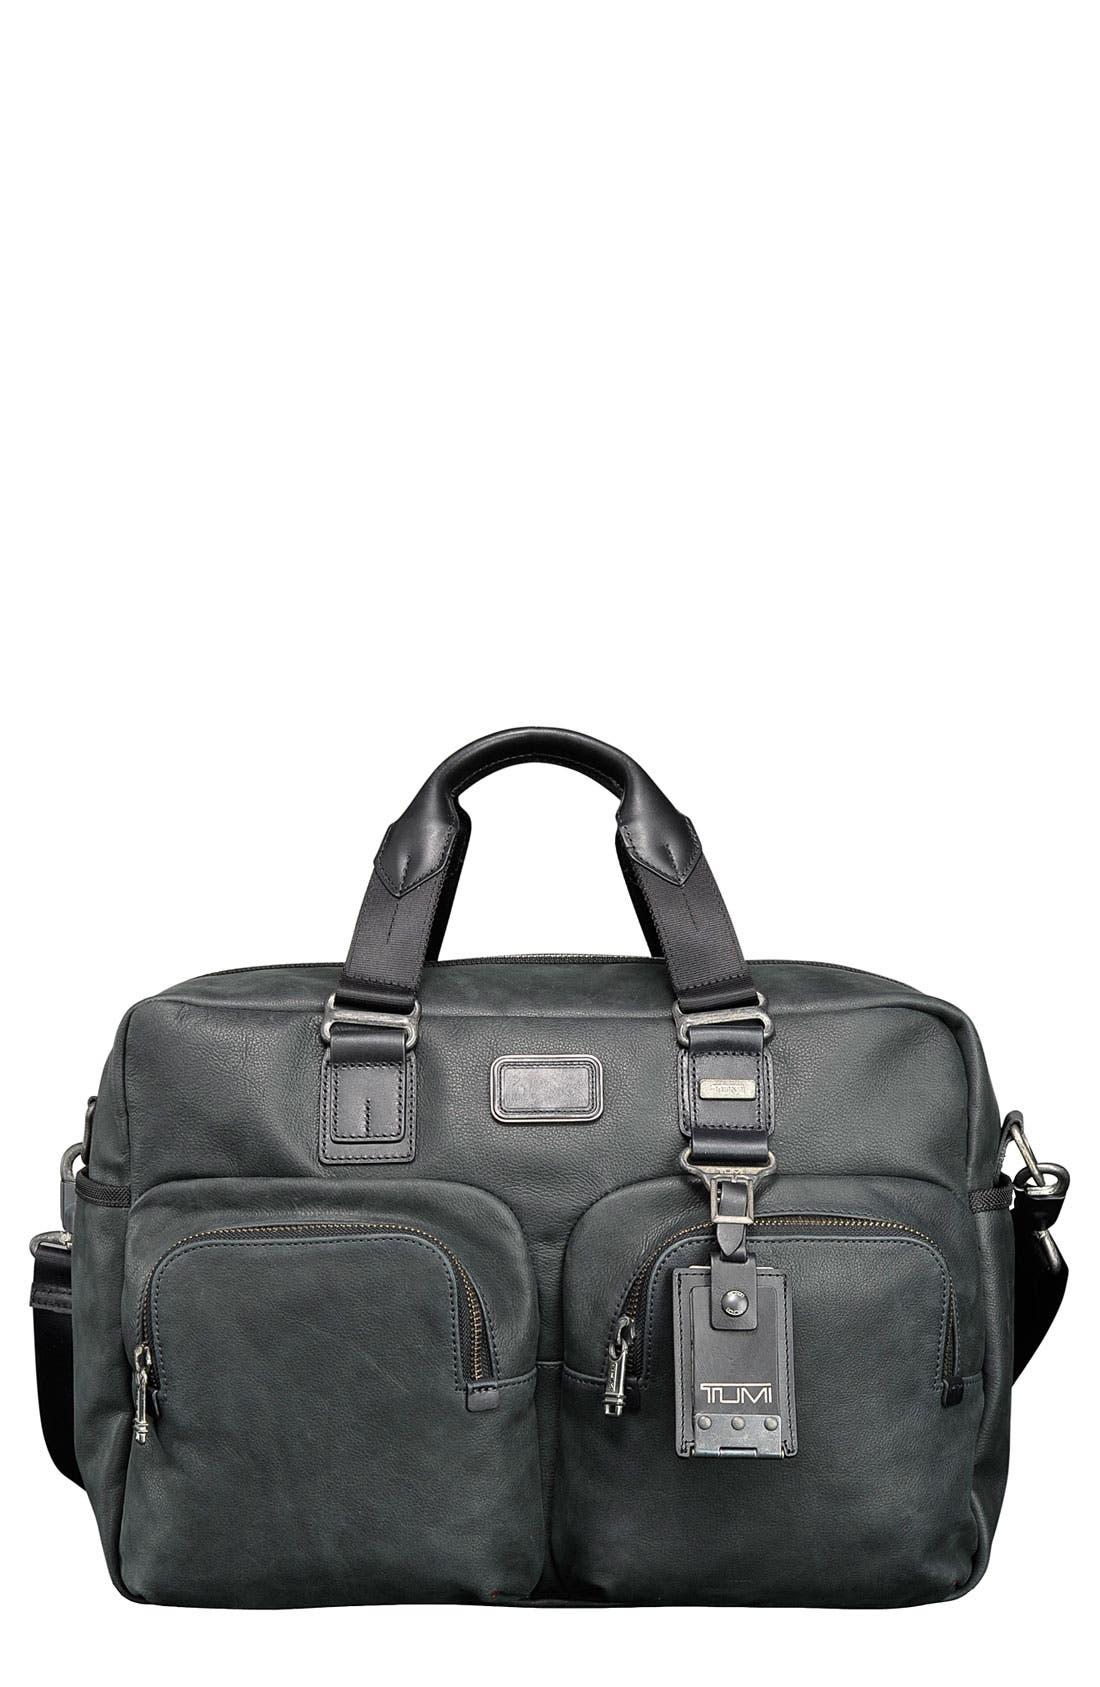 Main Image - Tumi 'Alpha Bravo - Everett' Essential Leather Tote